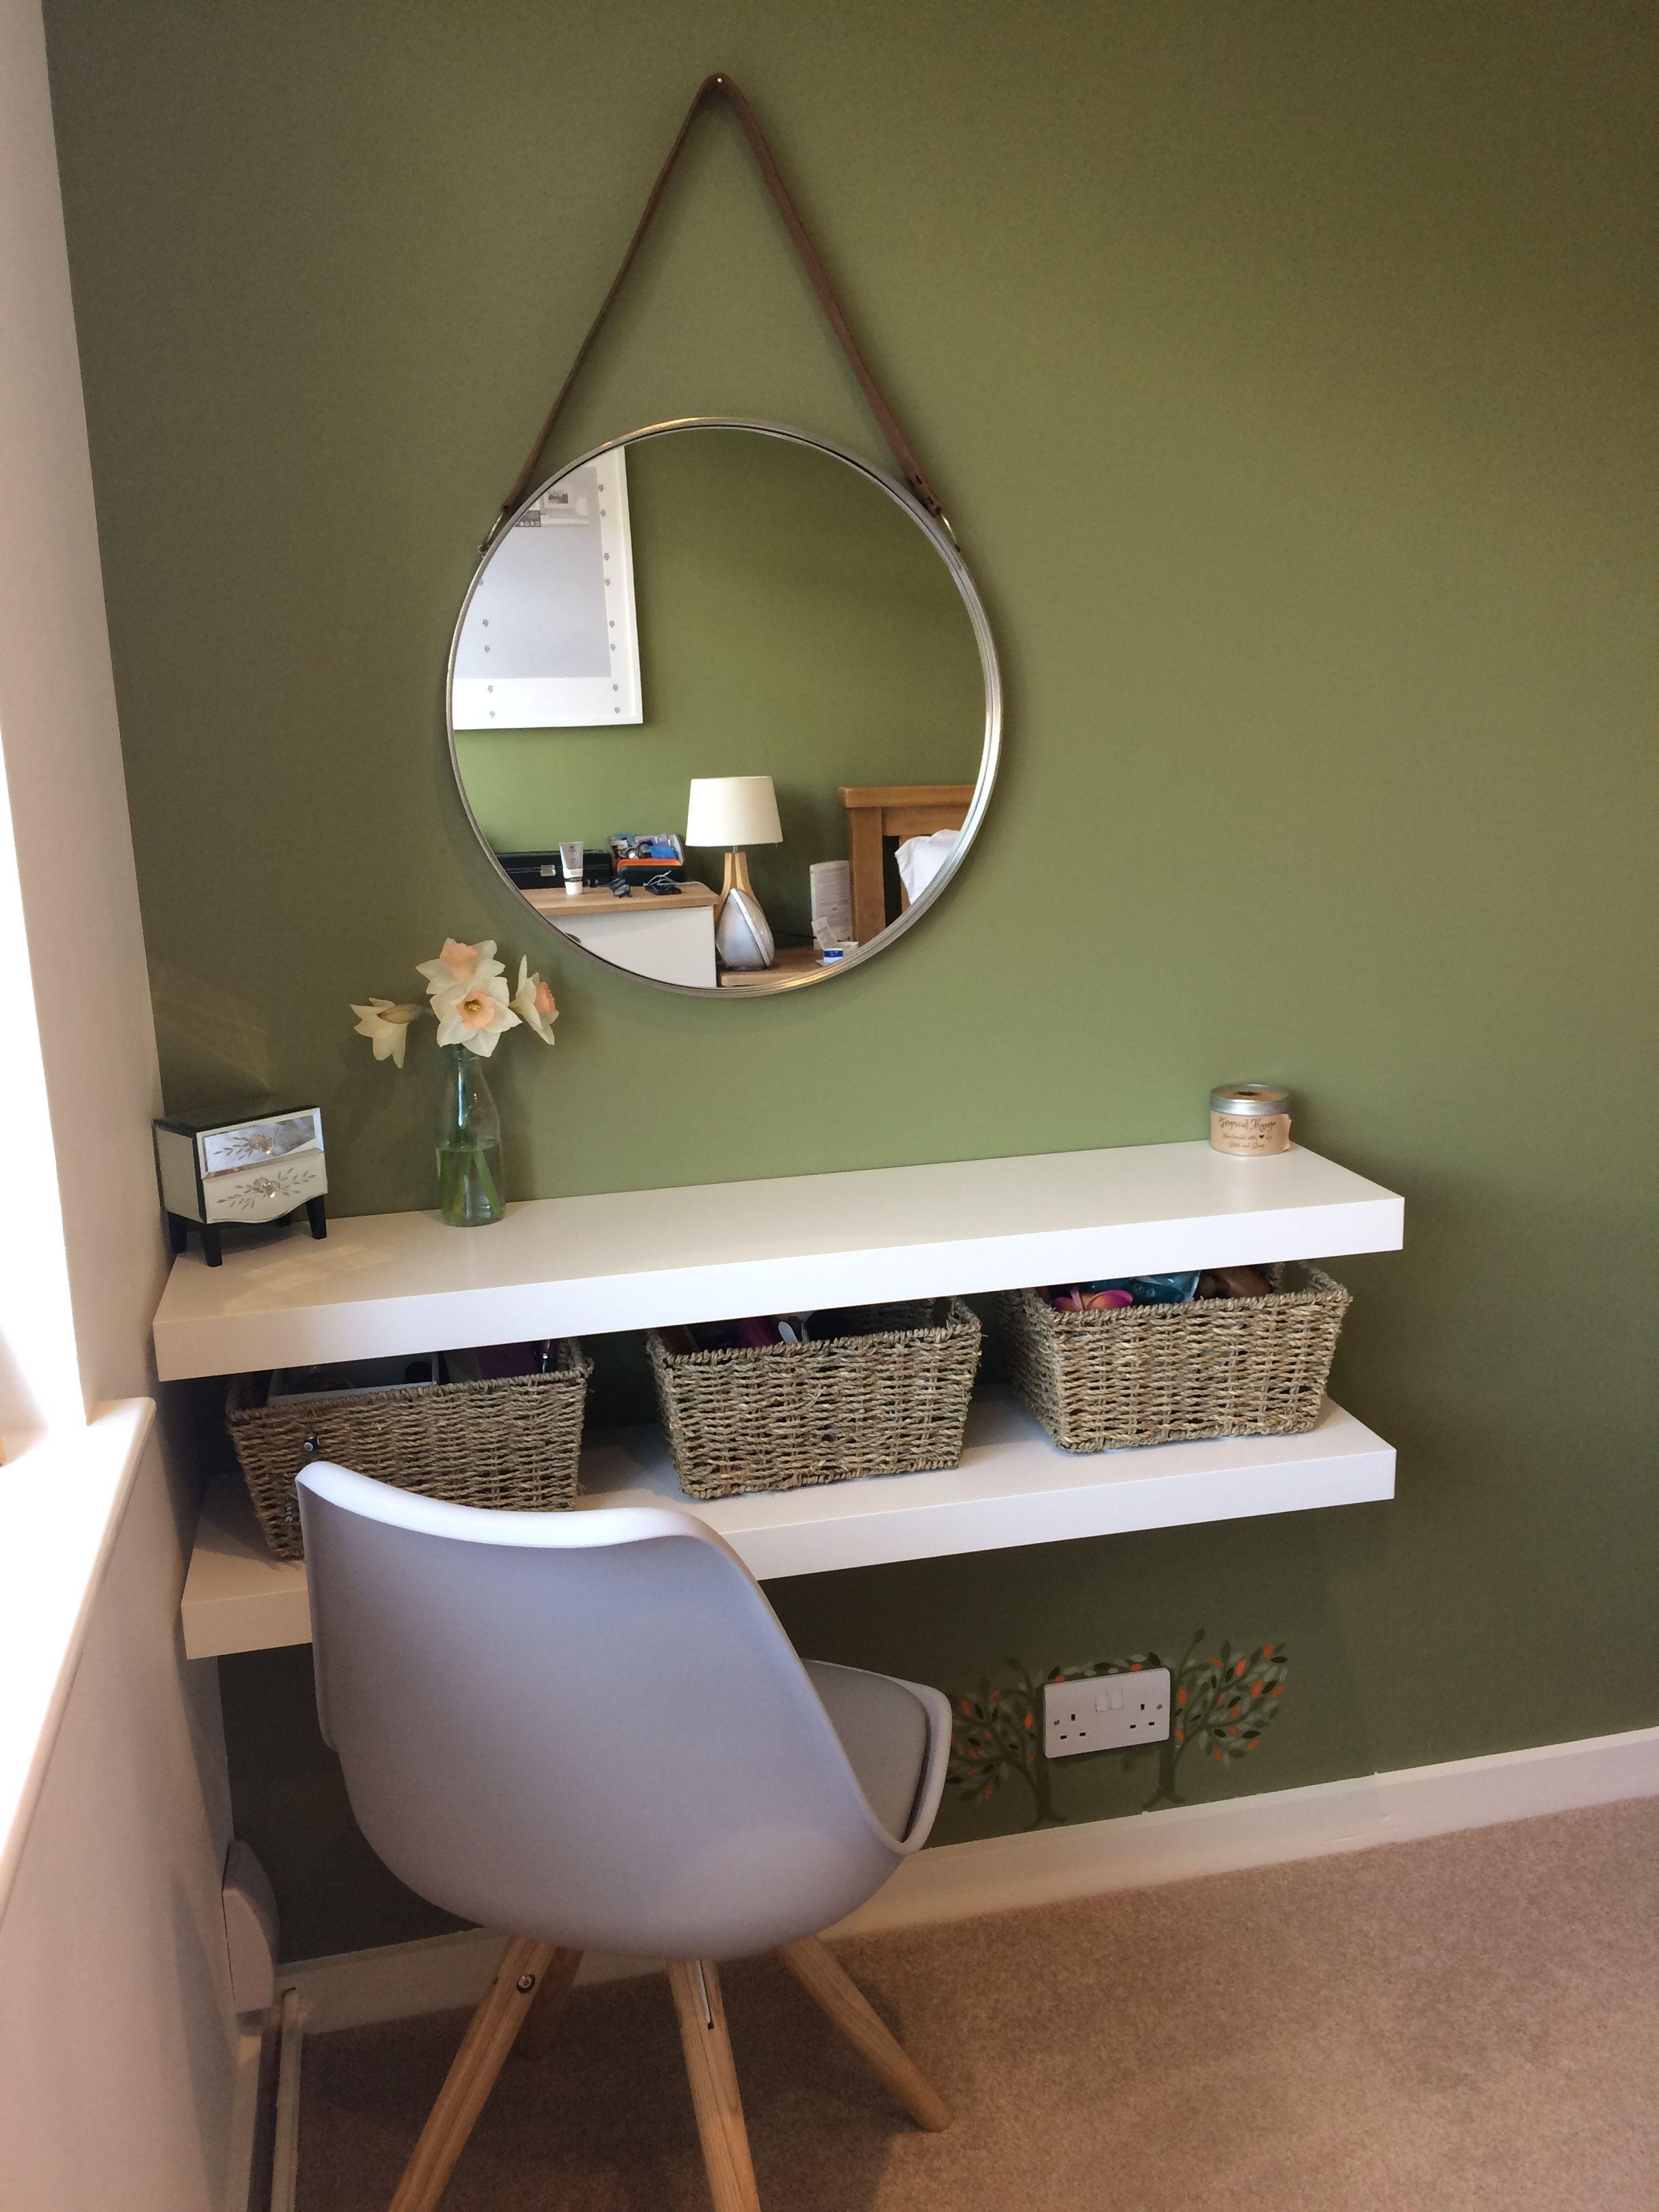 My Vanity Unit Ikea Shelves John Lewis Mirror Baskets Love It